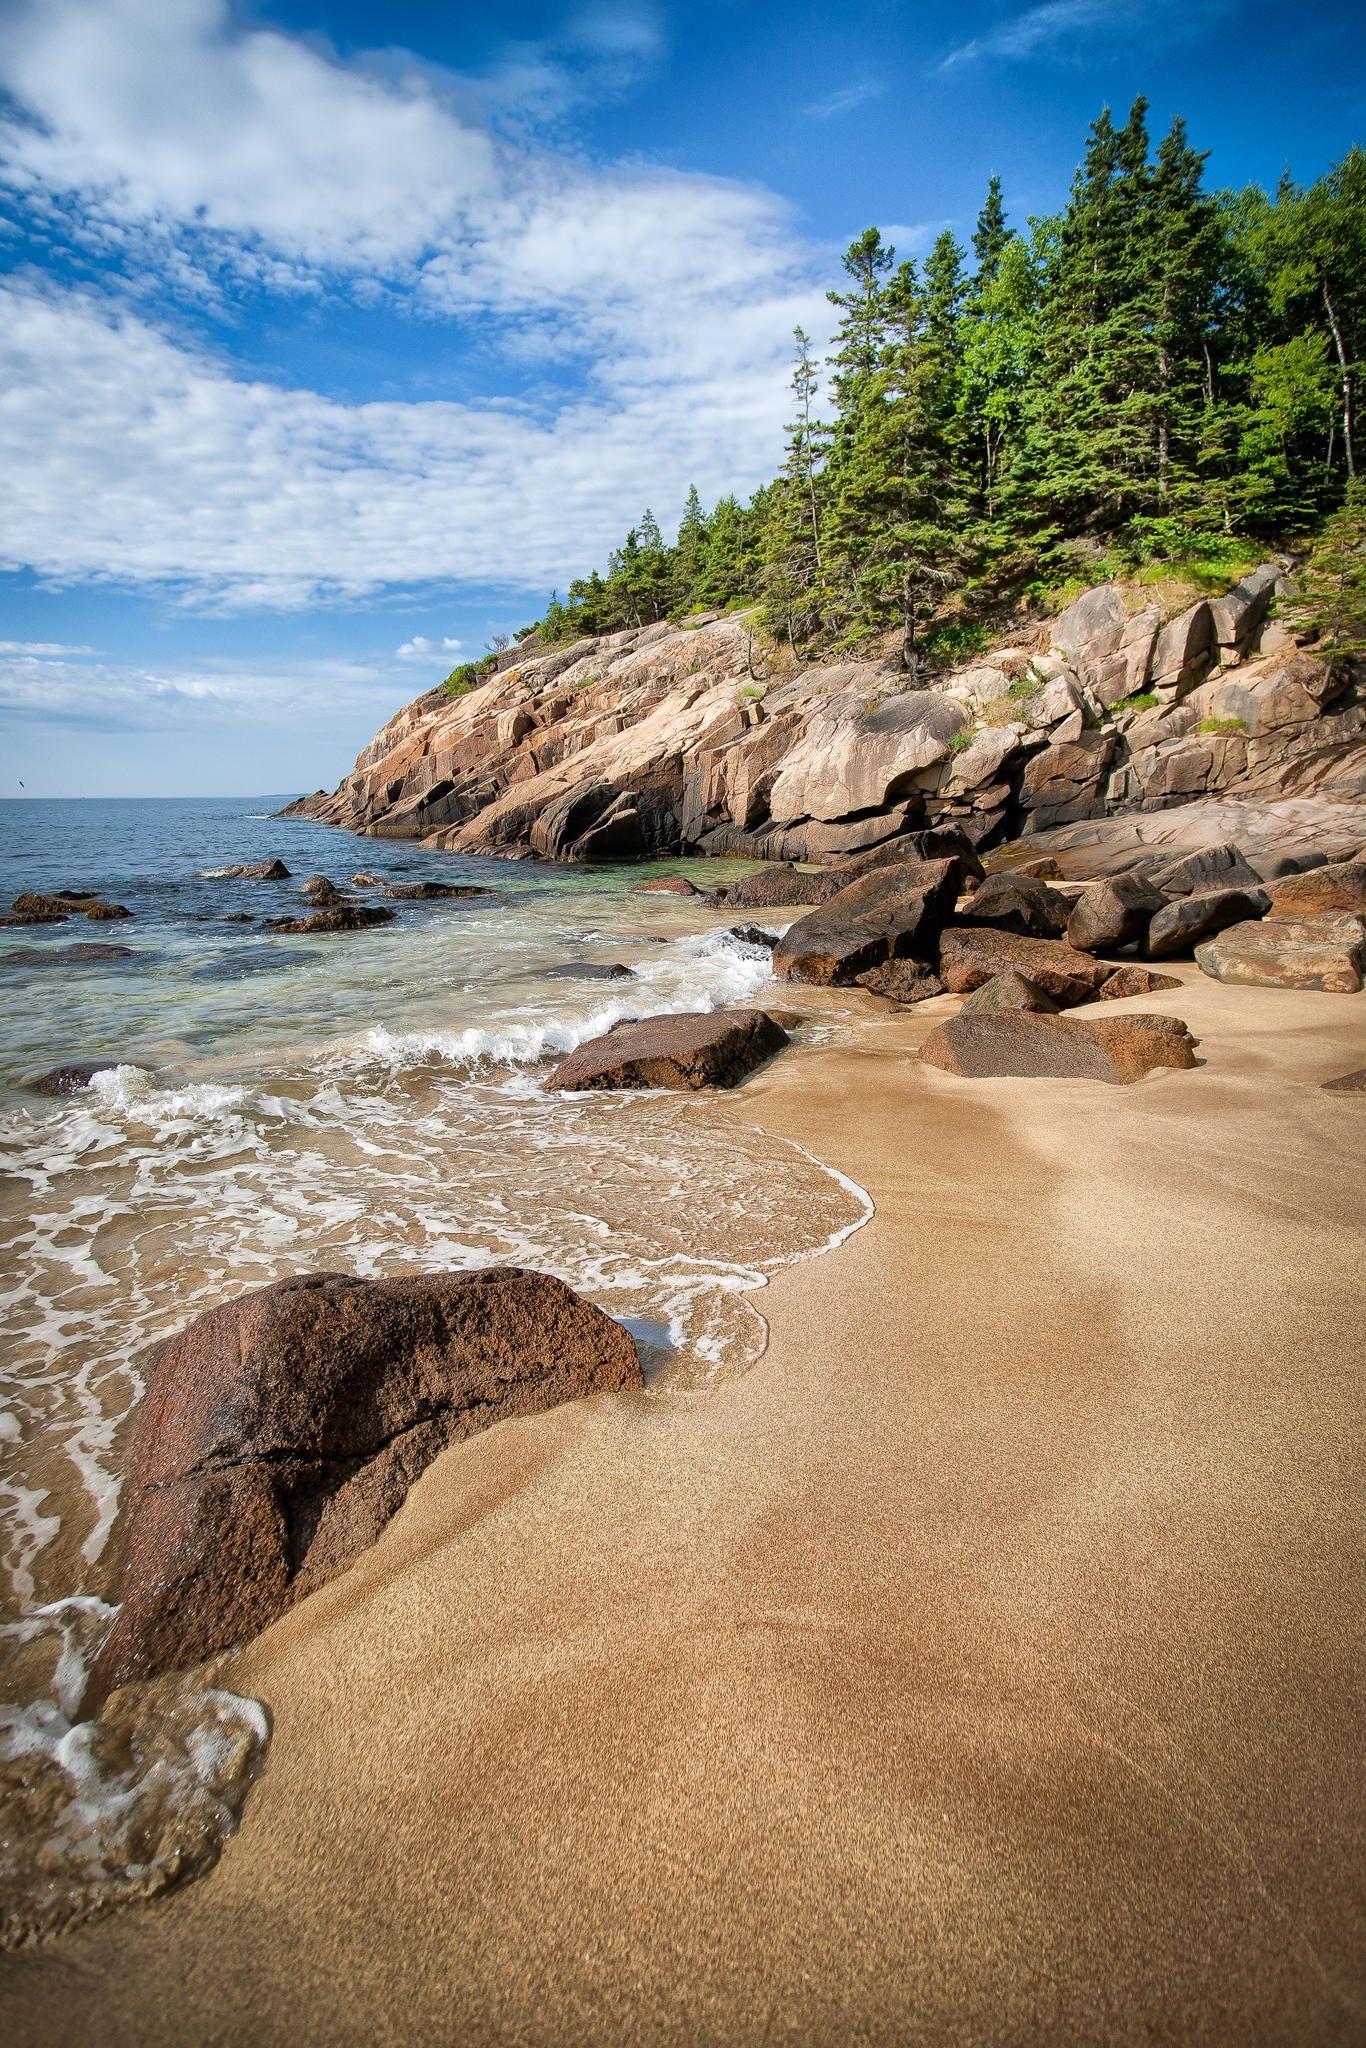 Sand Beach At Acadia National